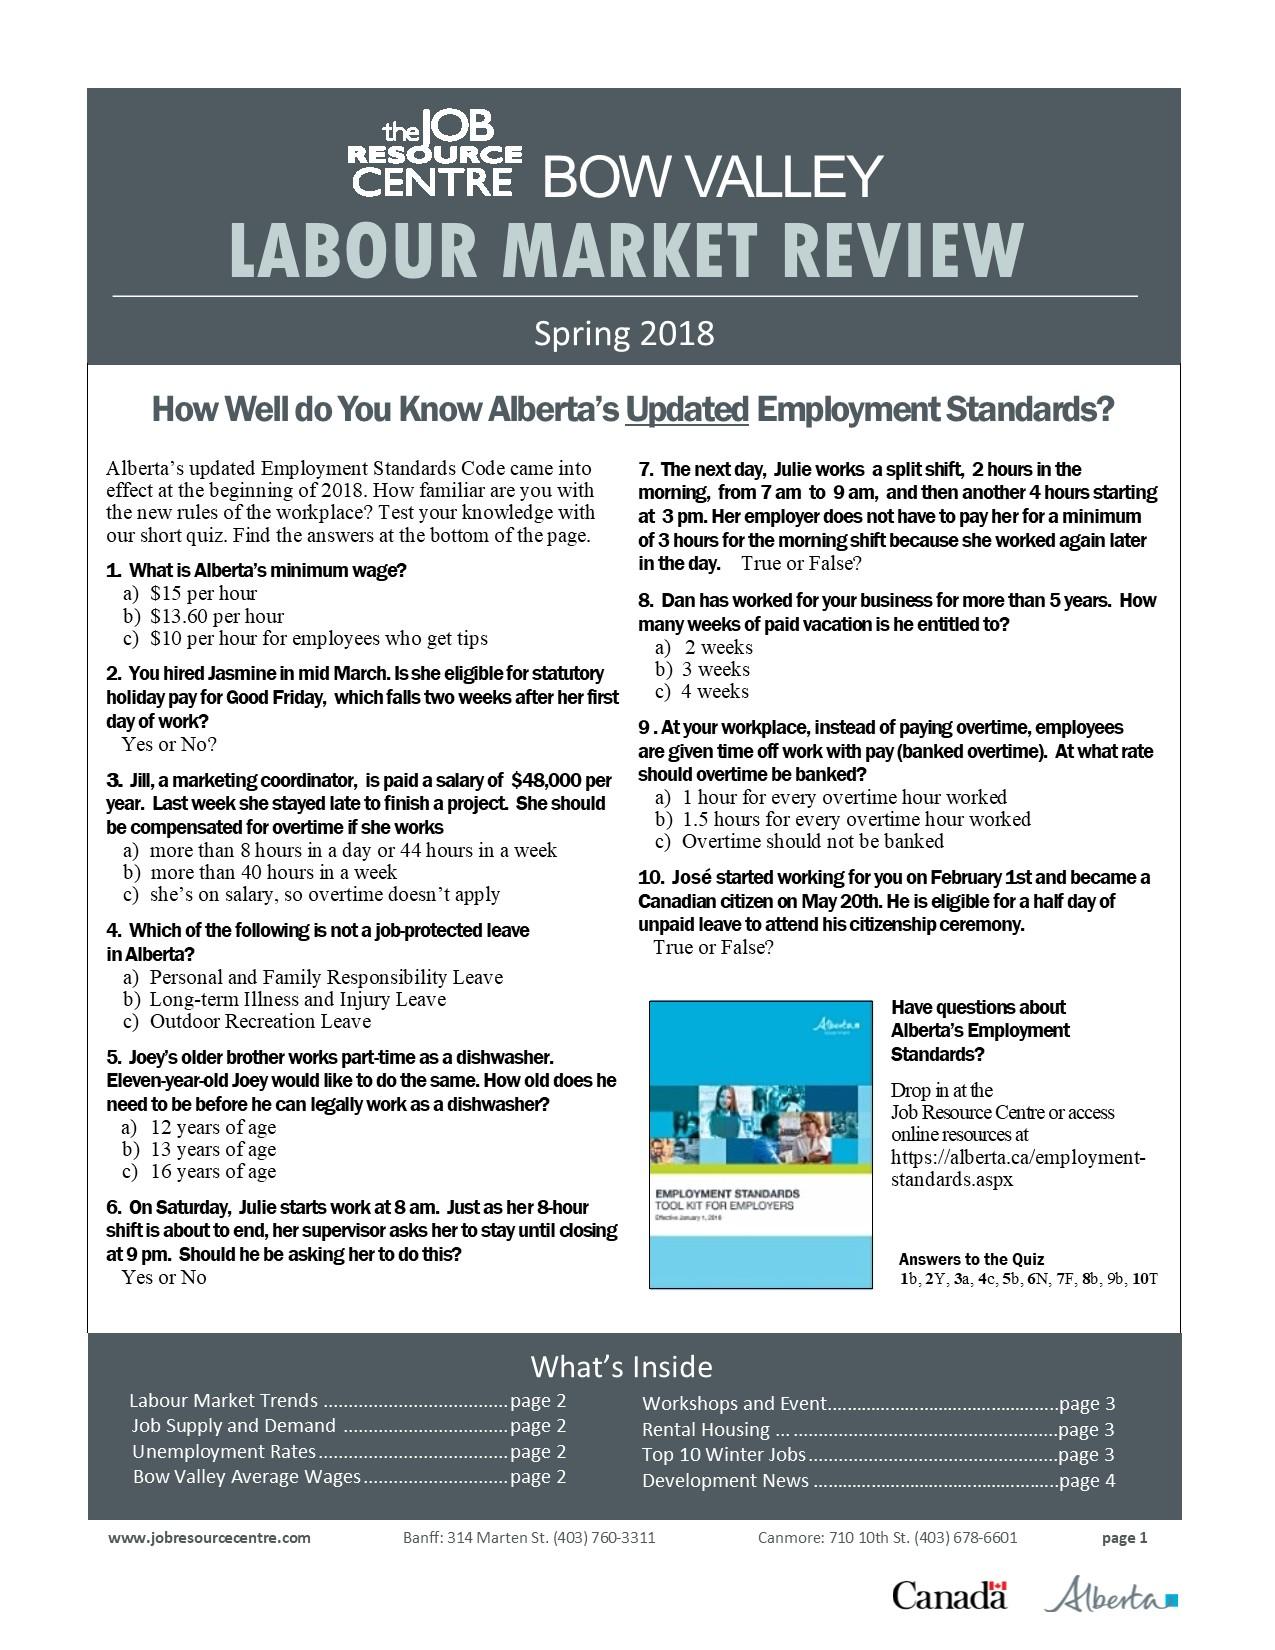 Job Resource Centre SPRING 2018 LMR.jpg